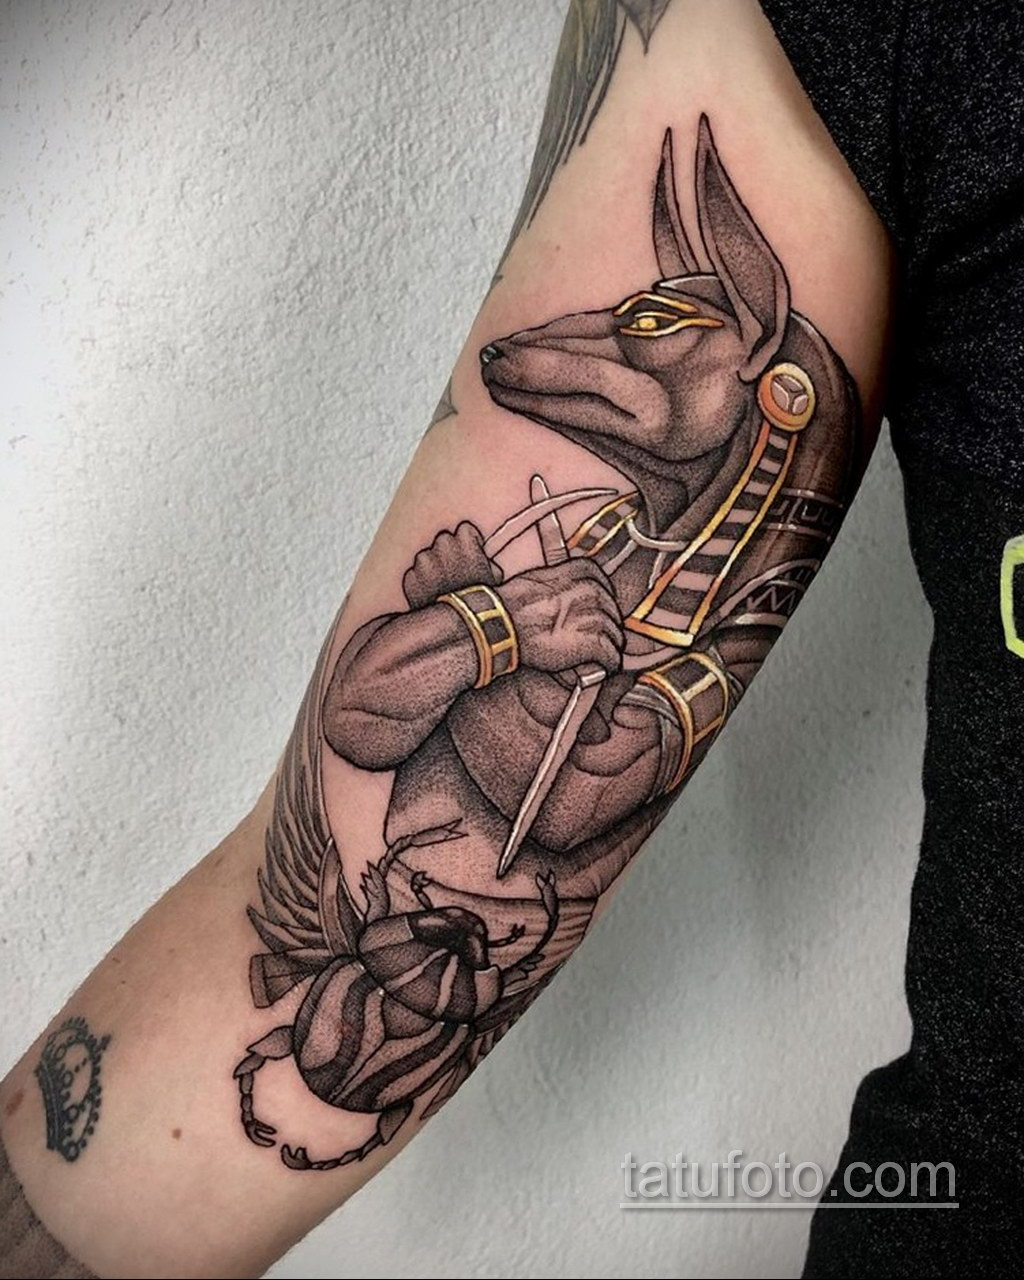 Фото анубис тату на предплечье 25.10.2020 №011 -forearm tattoo- tatufoto.com